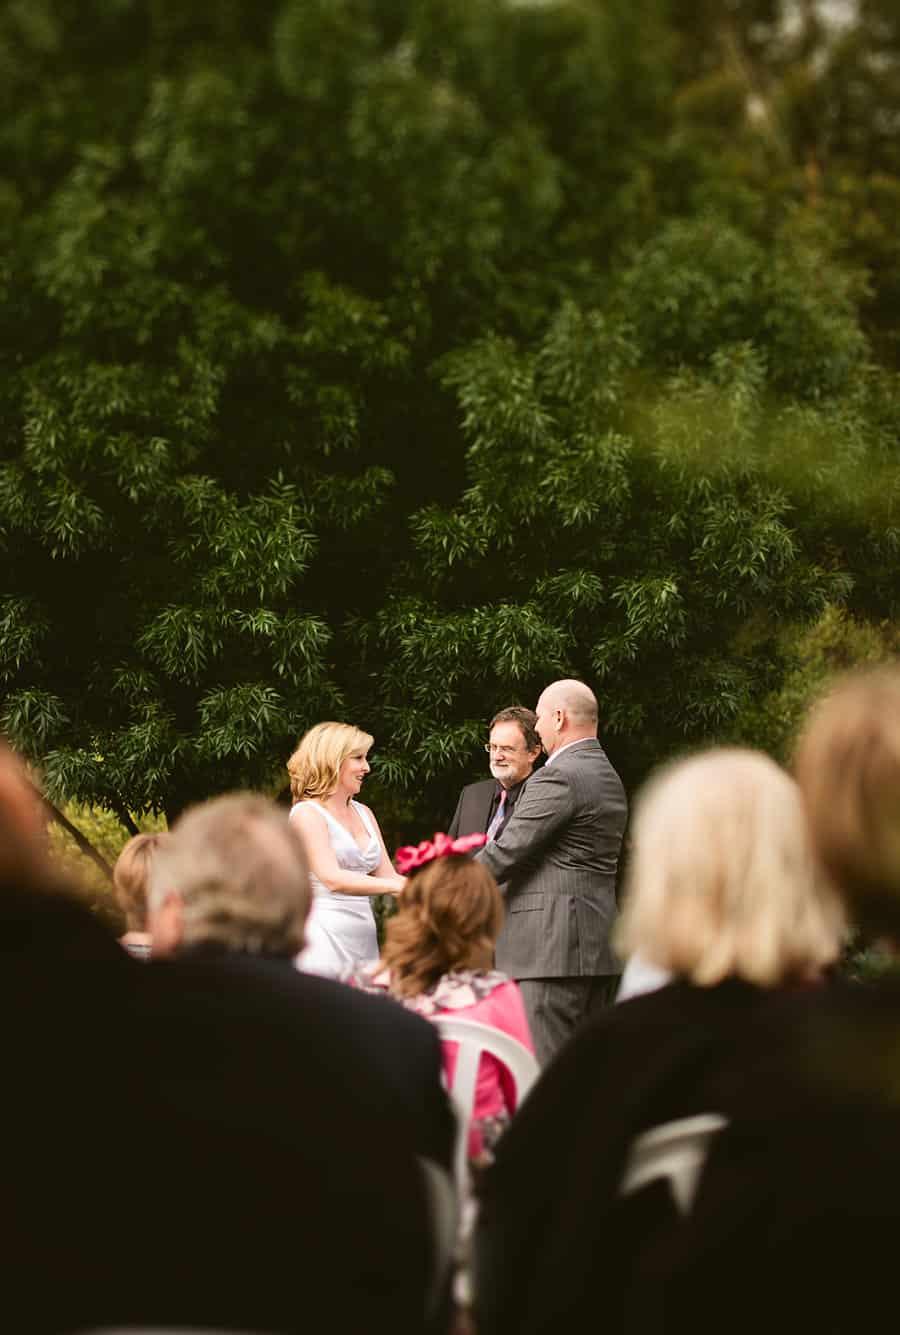 Haley & Rus Wedding - Ceremony